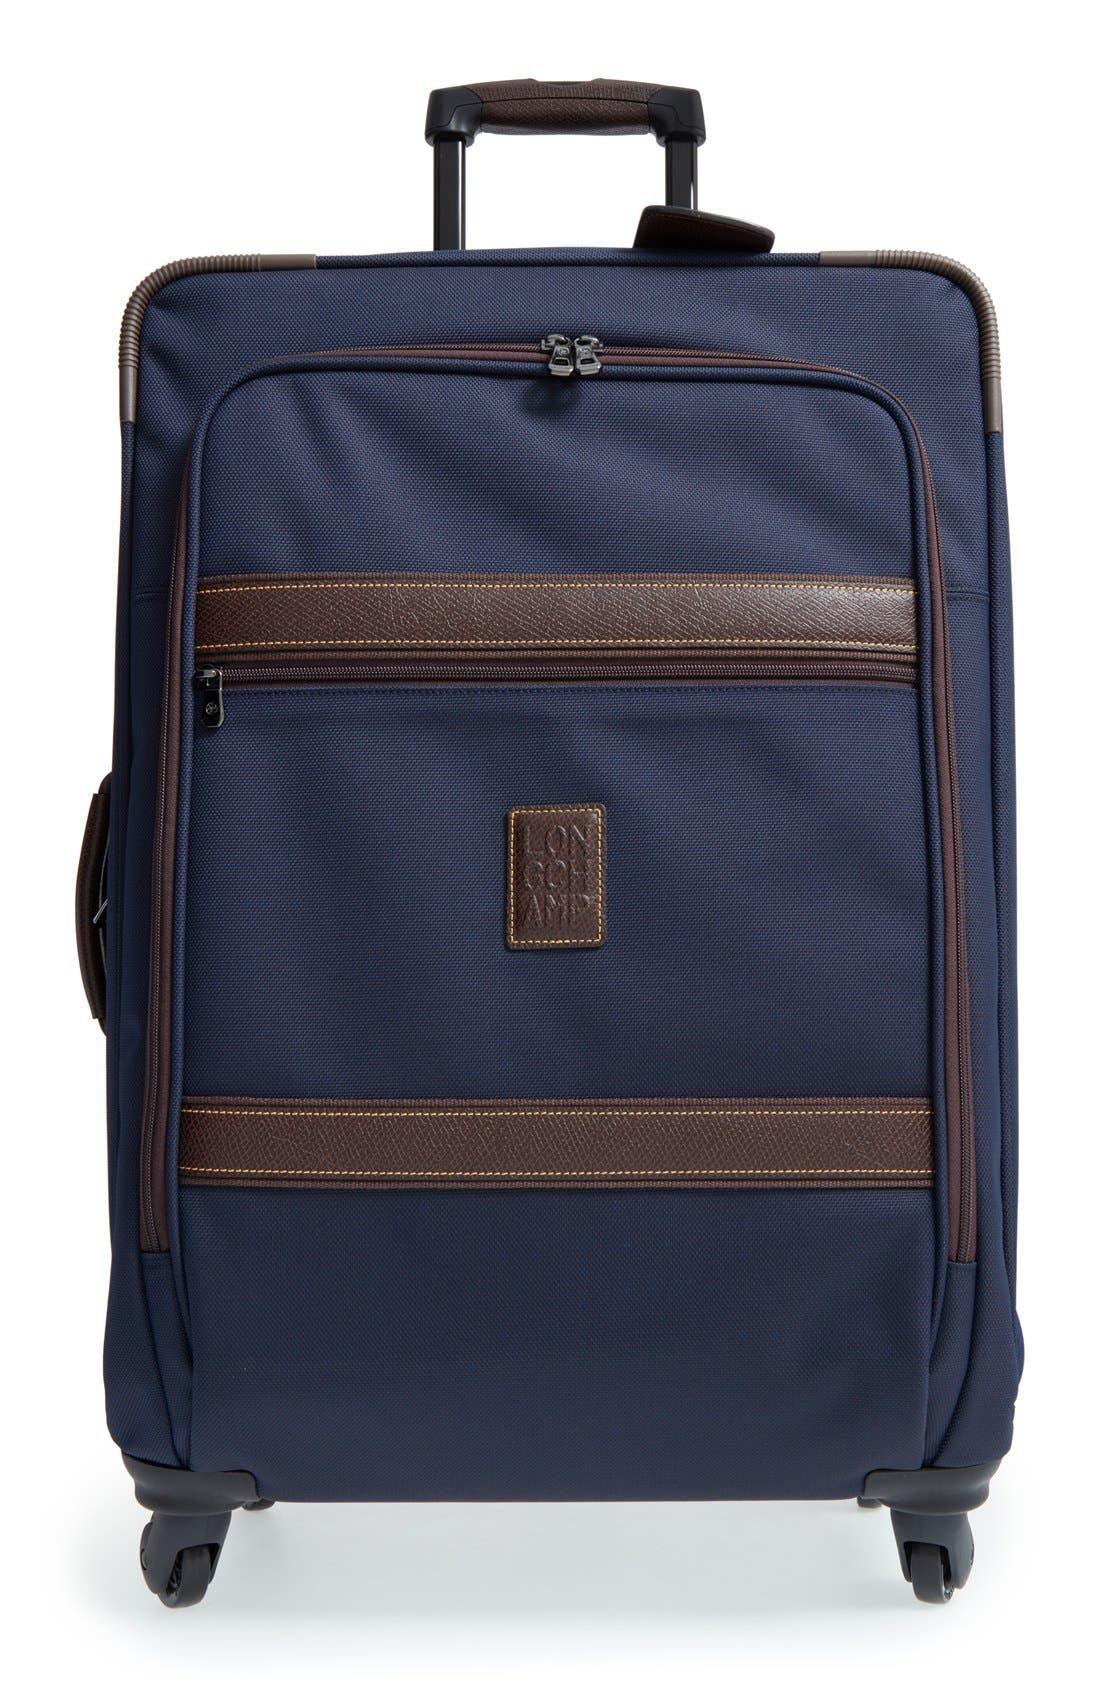 Longchamp 'Boxford' Boarding Suitcase (26 Inch)